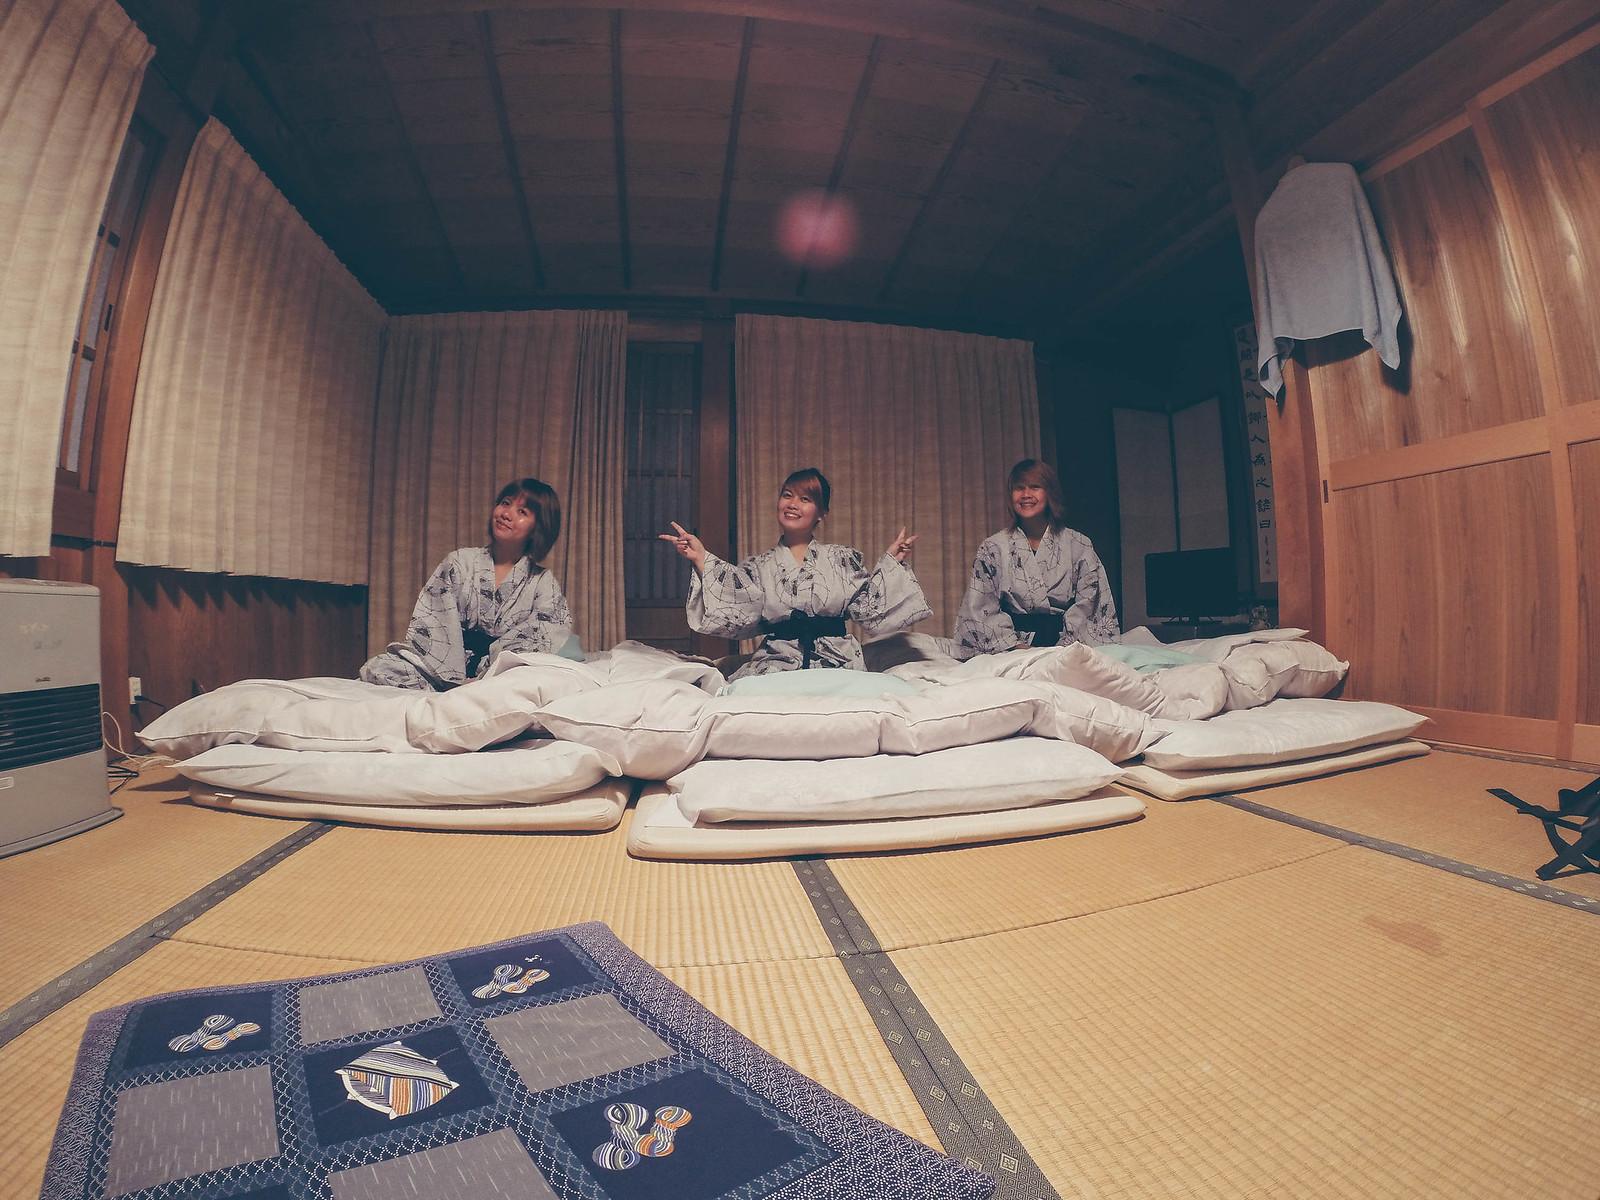 traditional Japanese room at Yokichi in Shirakawa-go